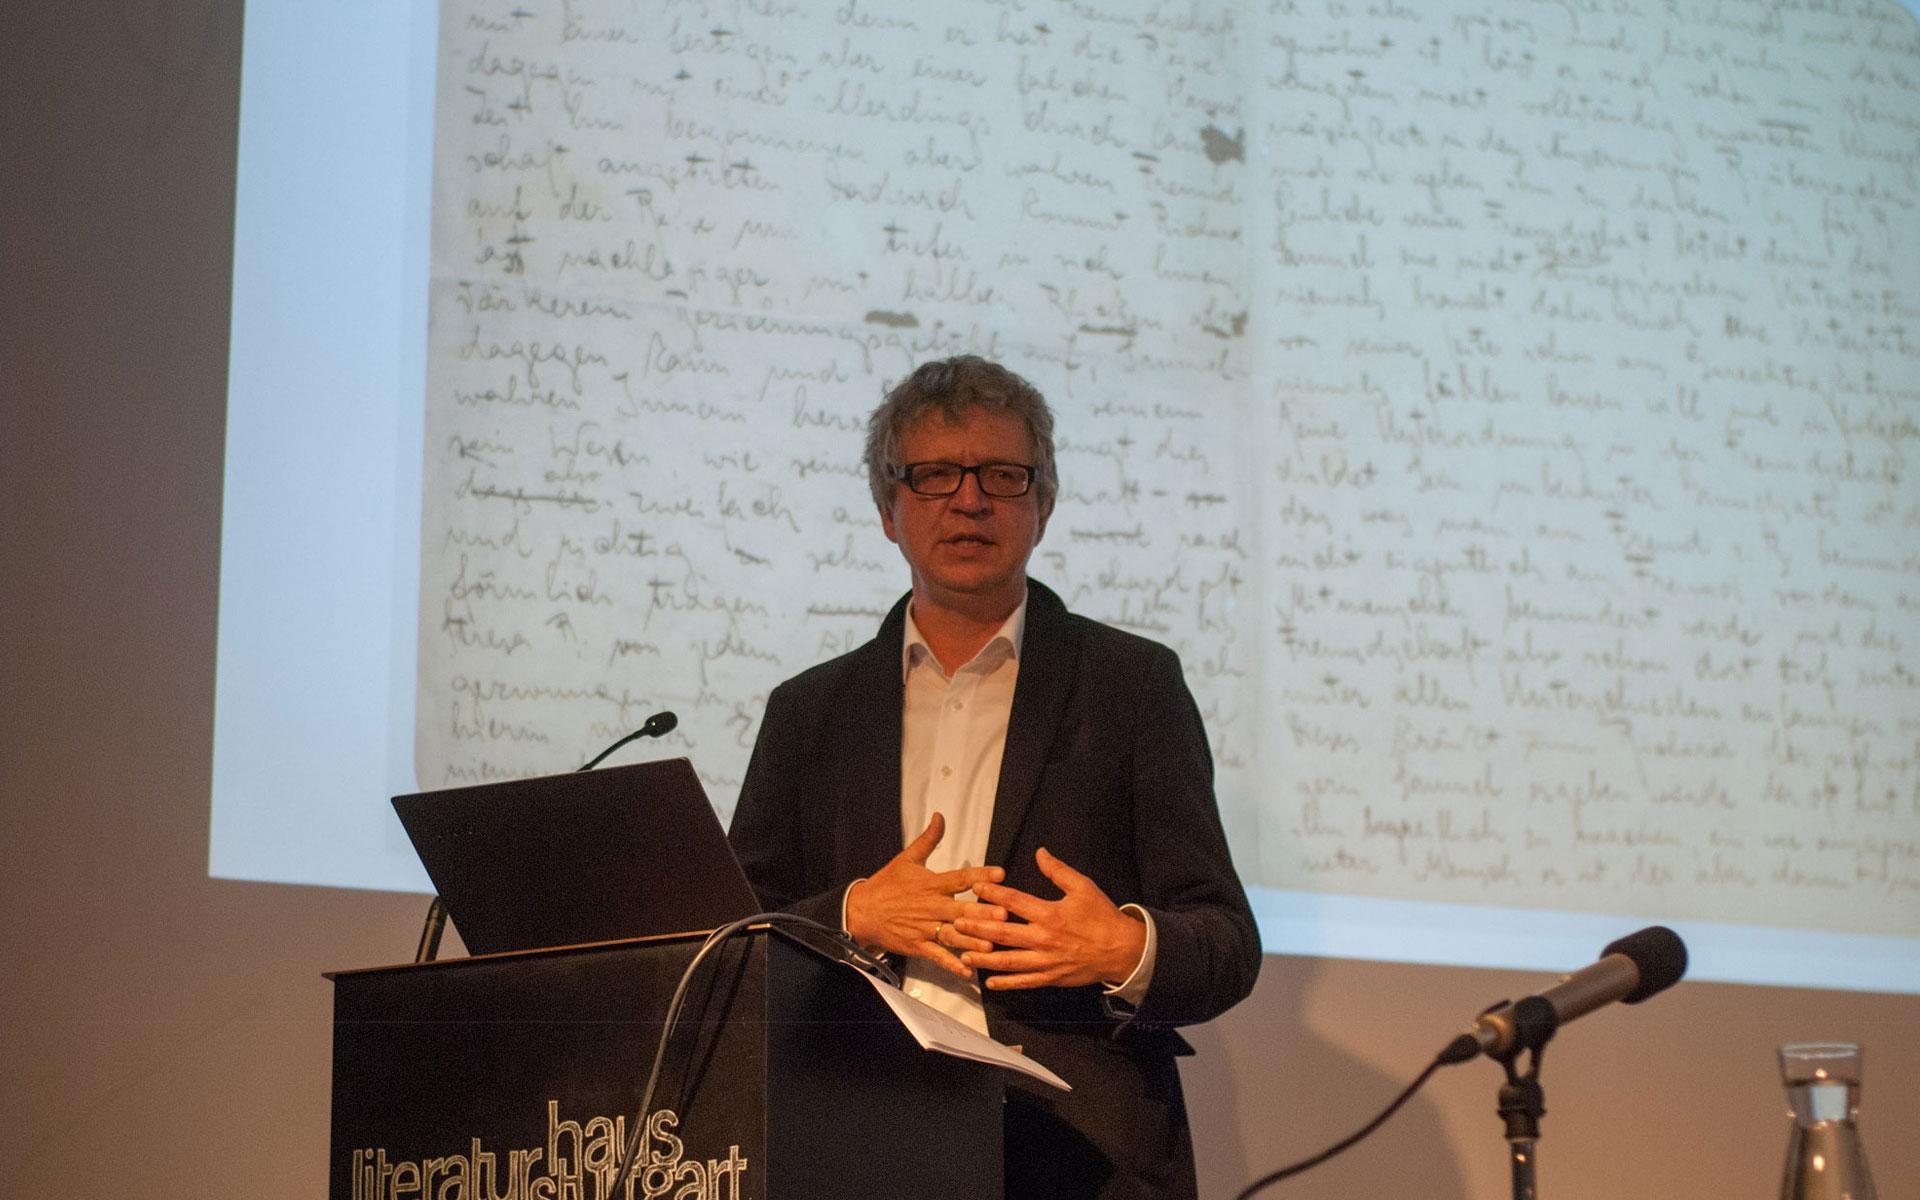 Benjamin Balint, Ulrich von Bülow: Kafkas letzter Prozess <br/>(c) Simon Adolphi